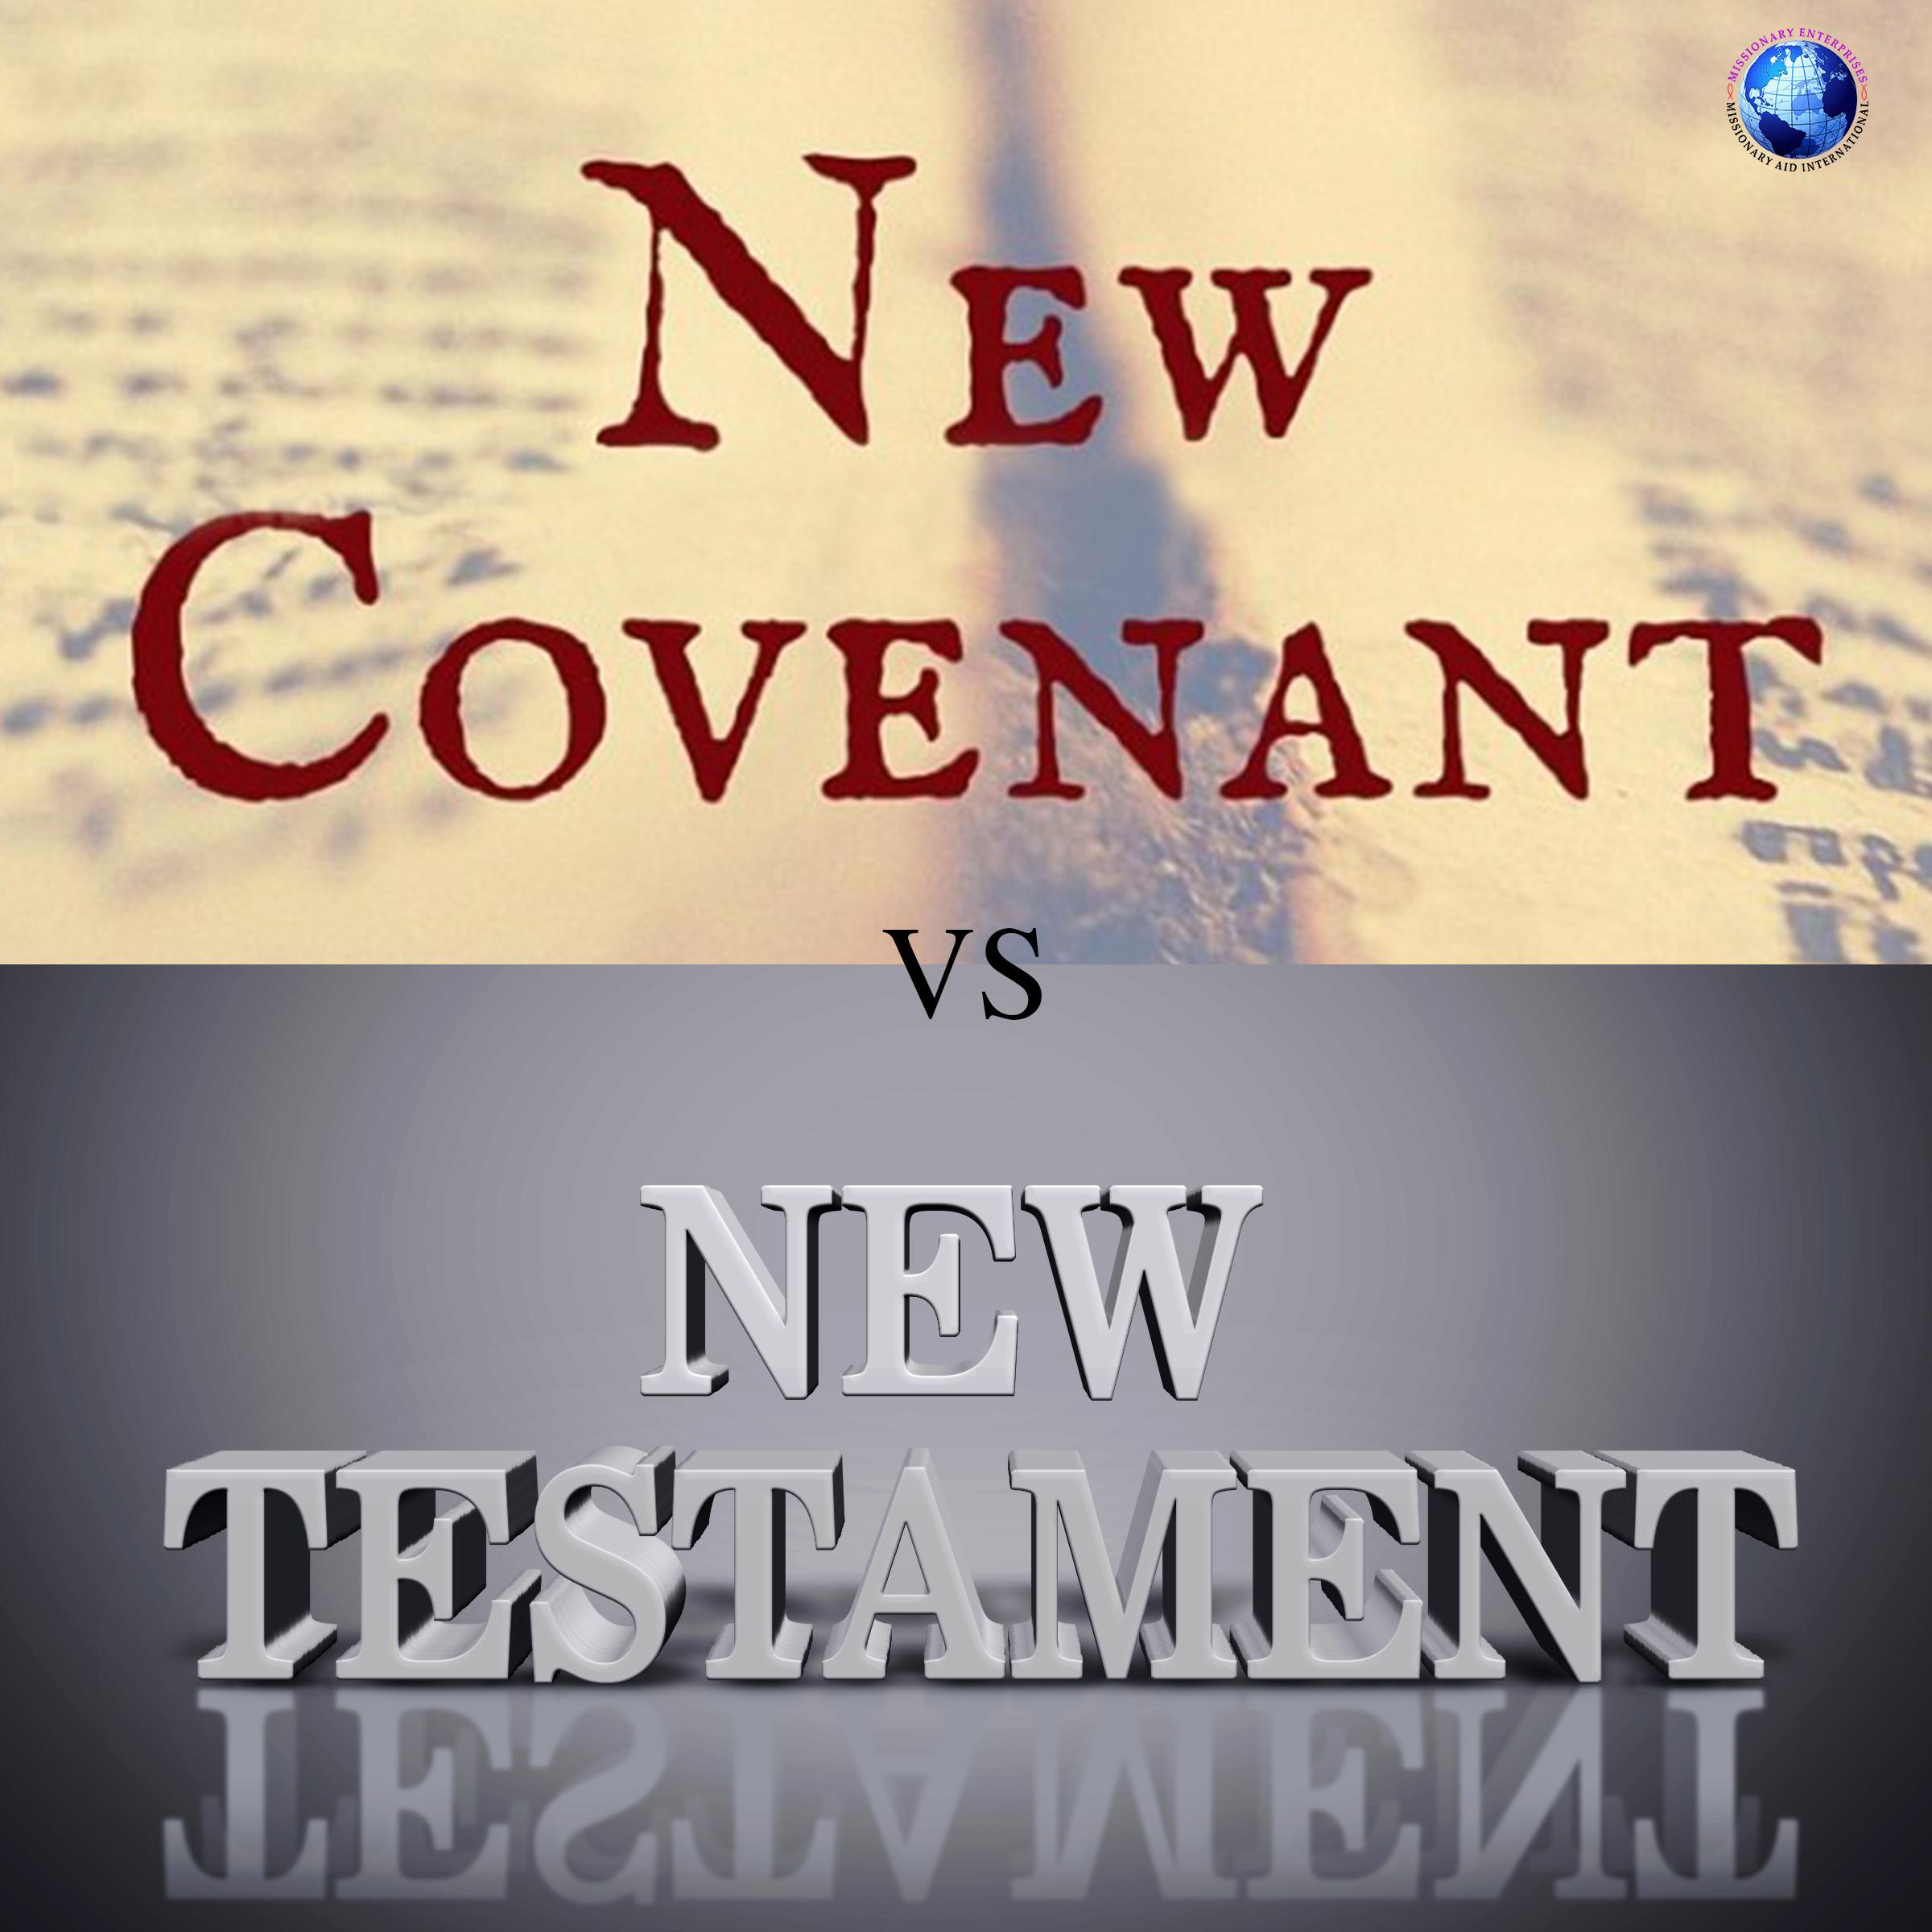 New Covenant vs New Testament